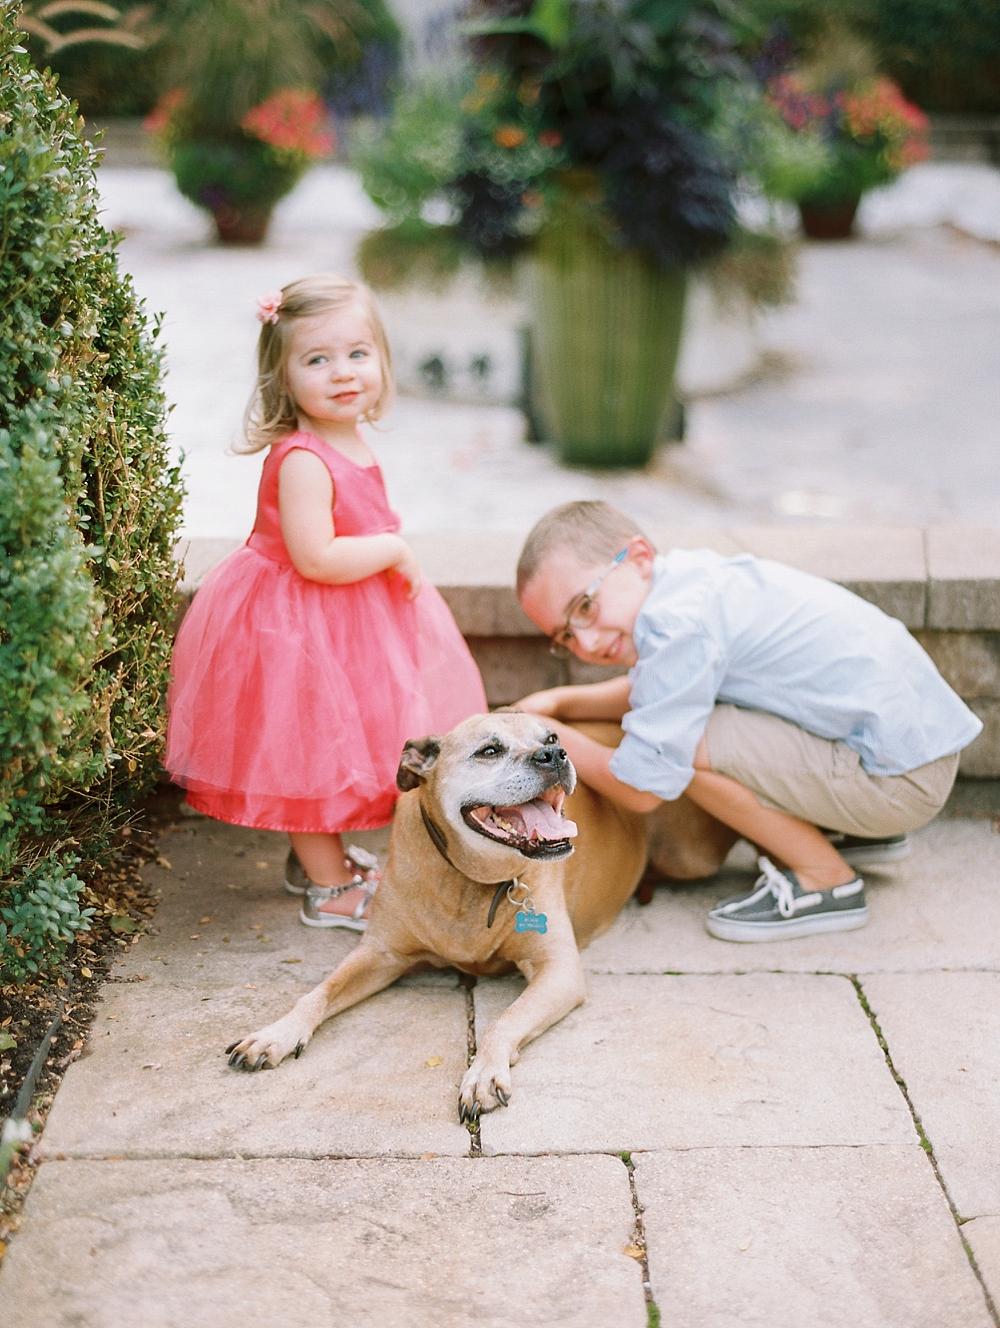 kristin-la-voie-photography-lifestyle-chicago-dog-19